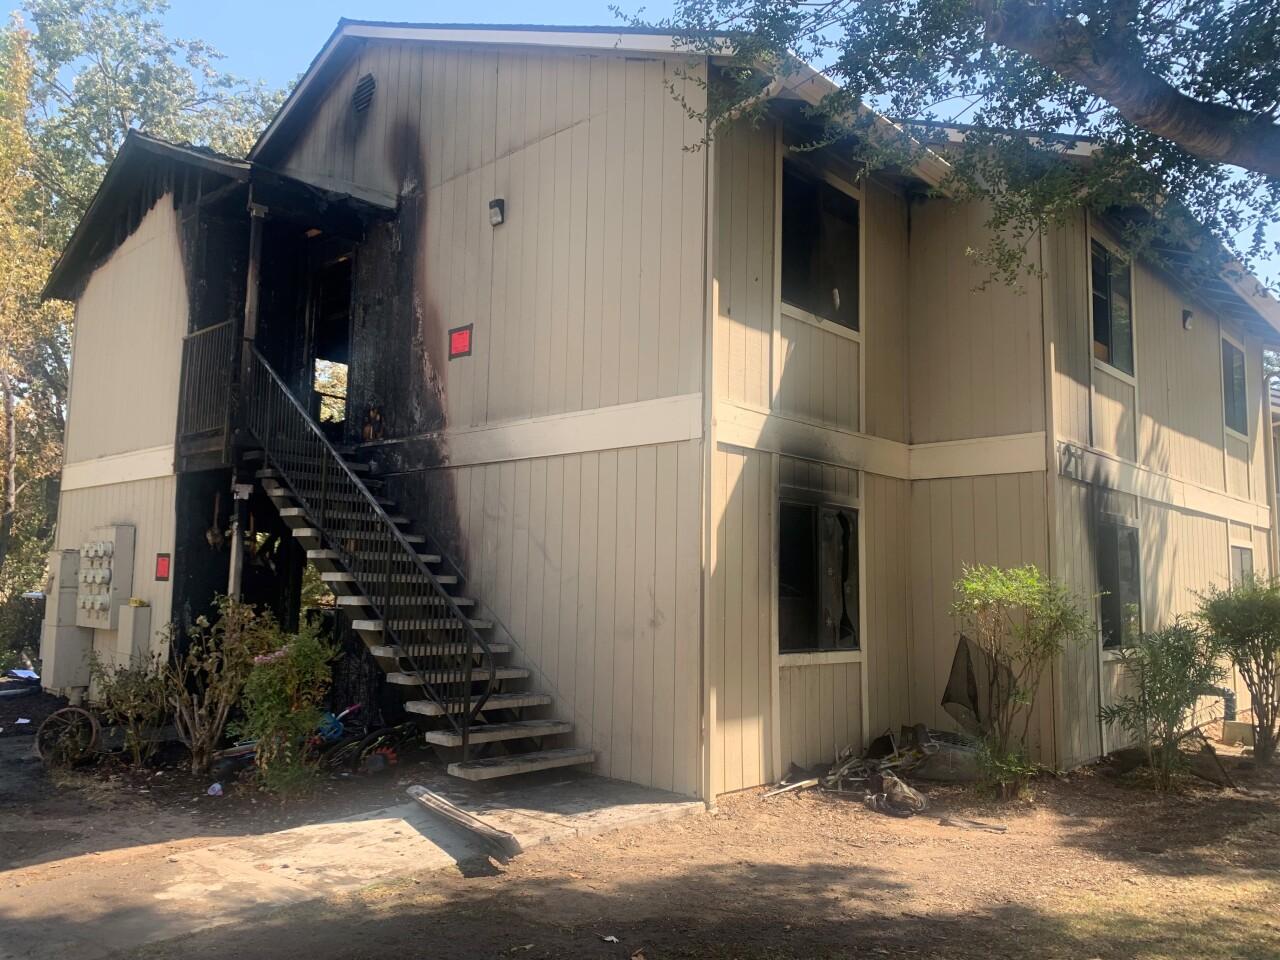 paso dry creek apartments fire.jpg